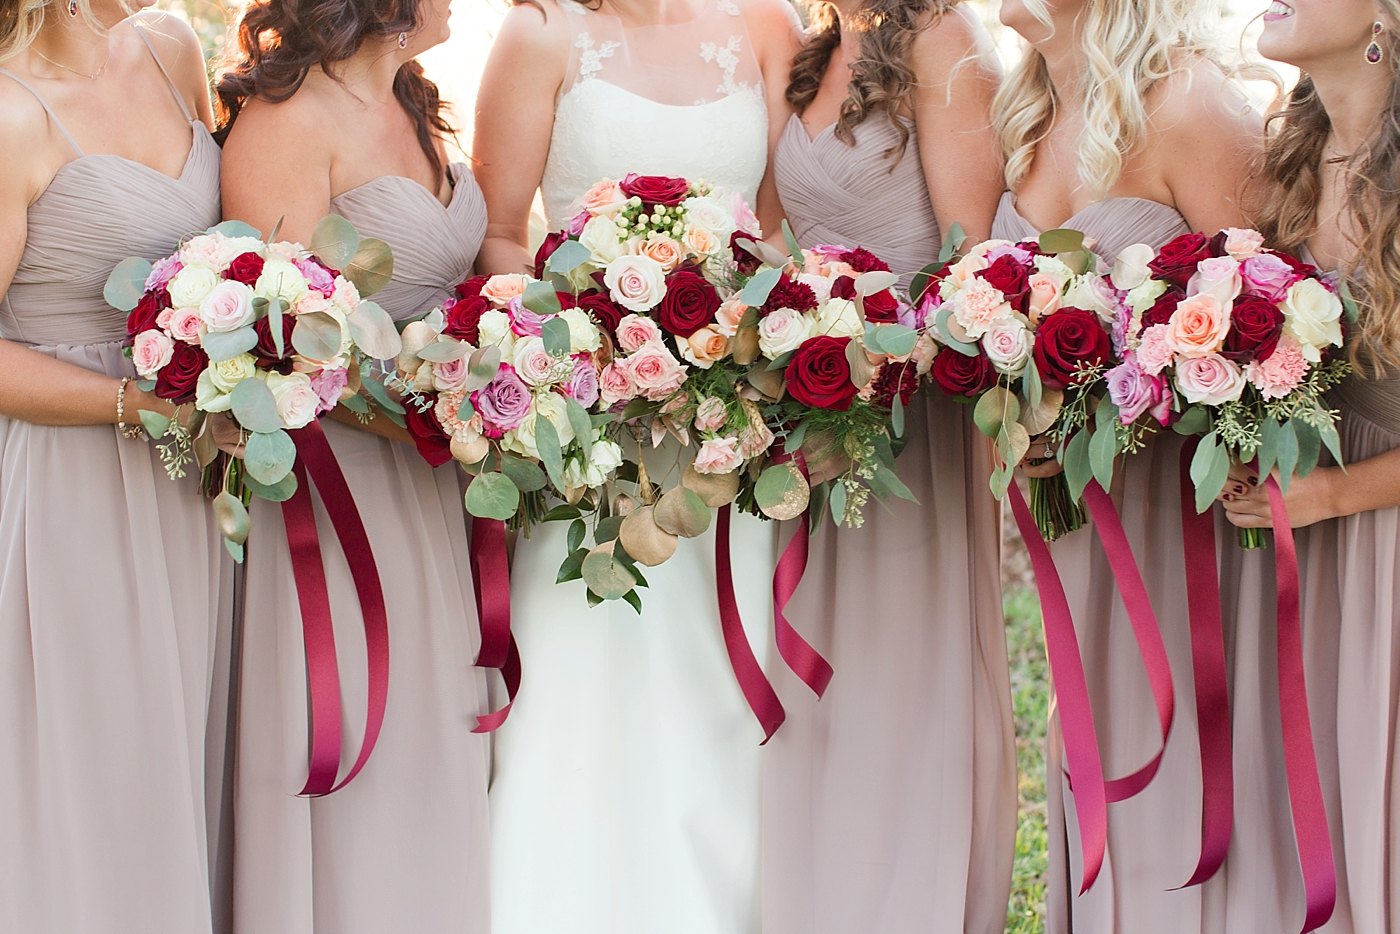 greenville-nc-wedding-the-robins-nest_33.jpg